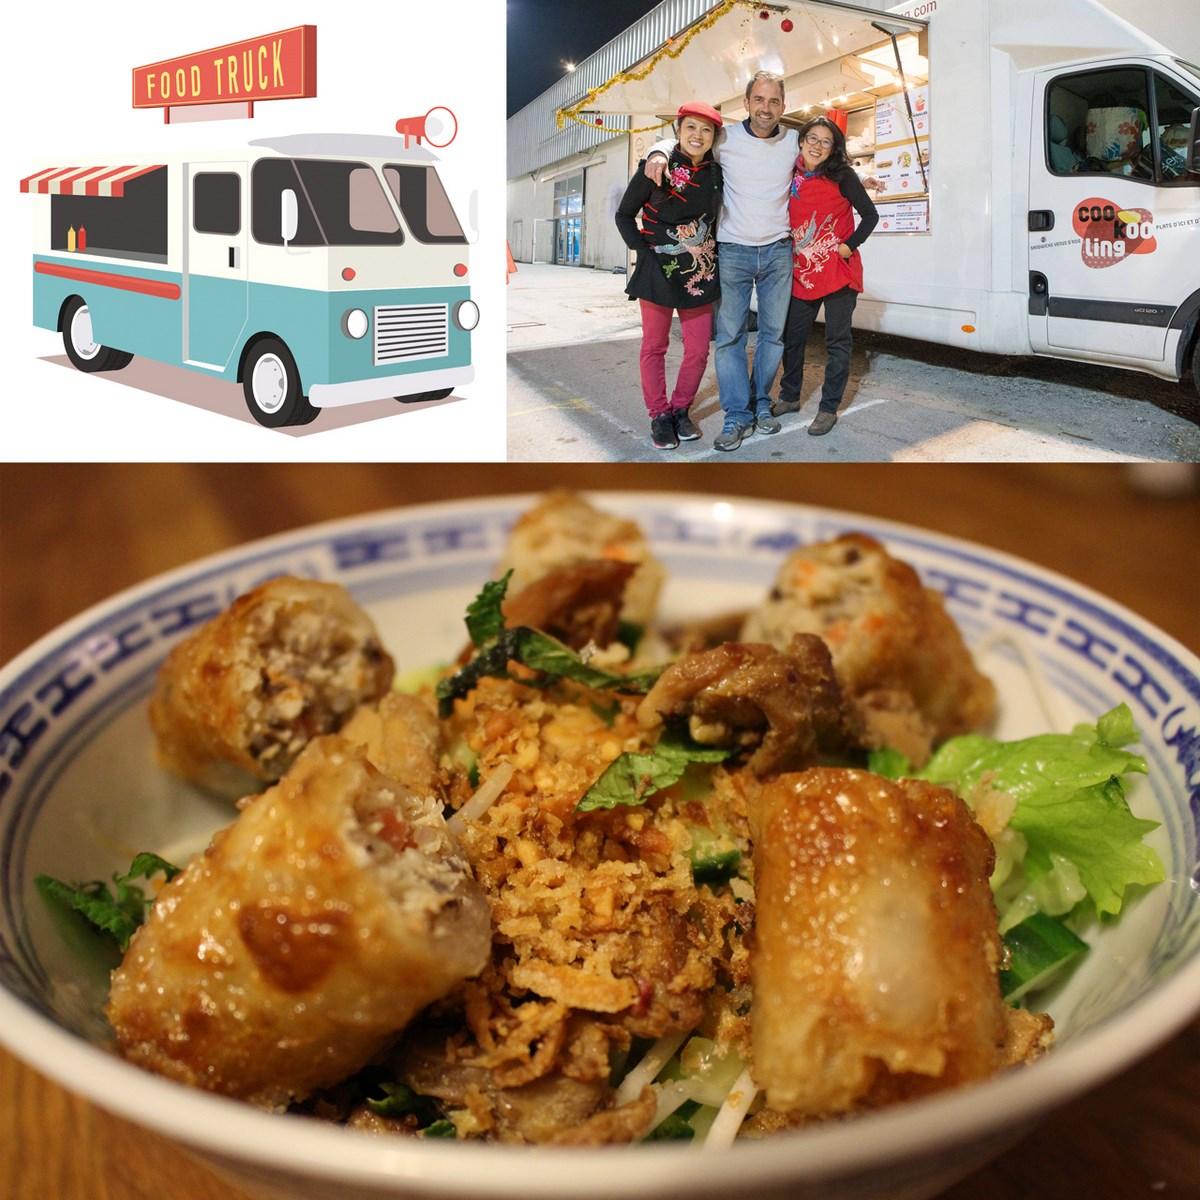 COOKOOLING // Le Food Truck aux saveurs d'Asie